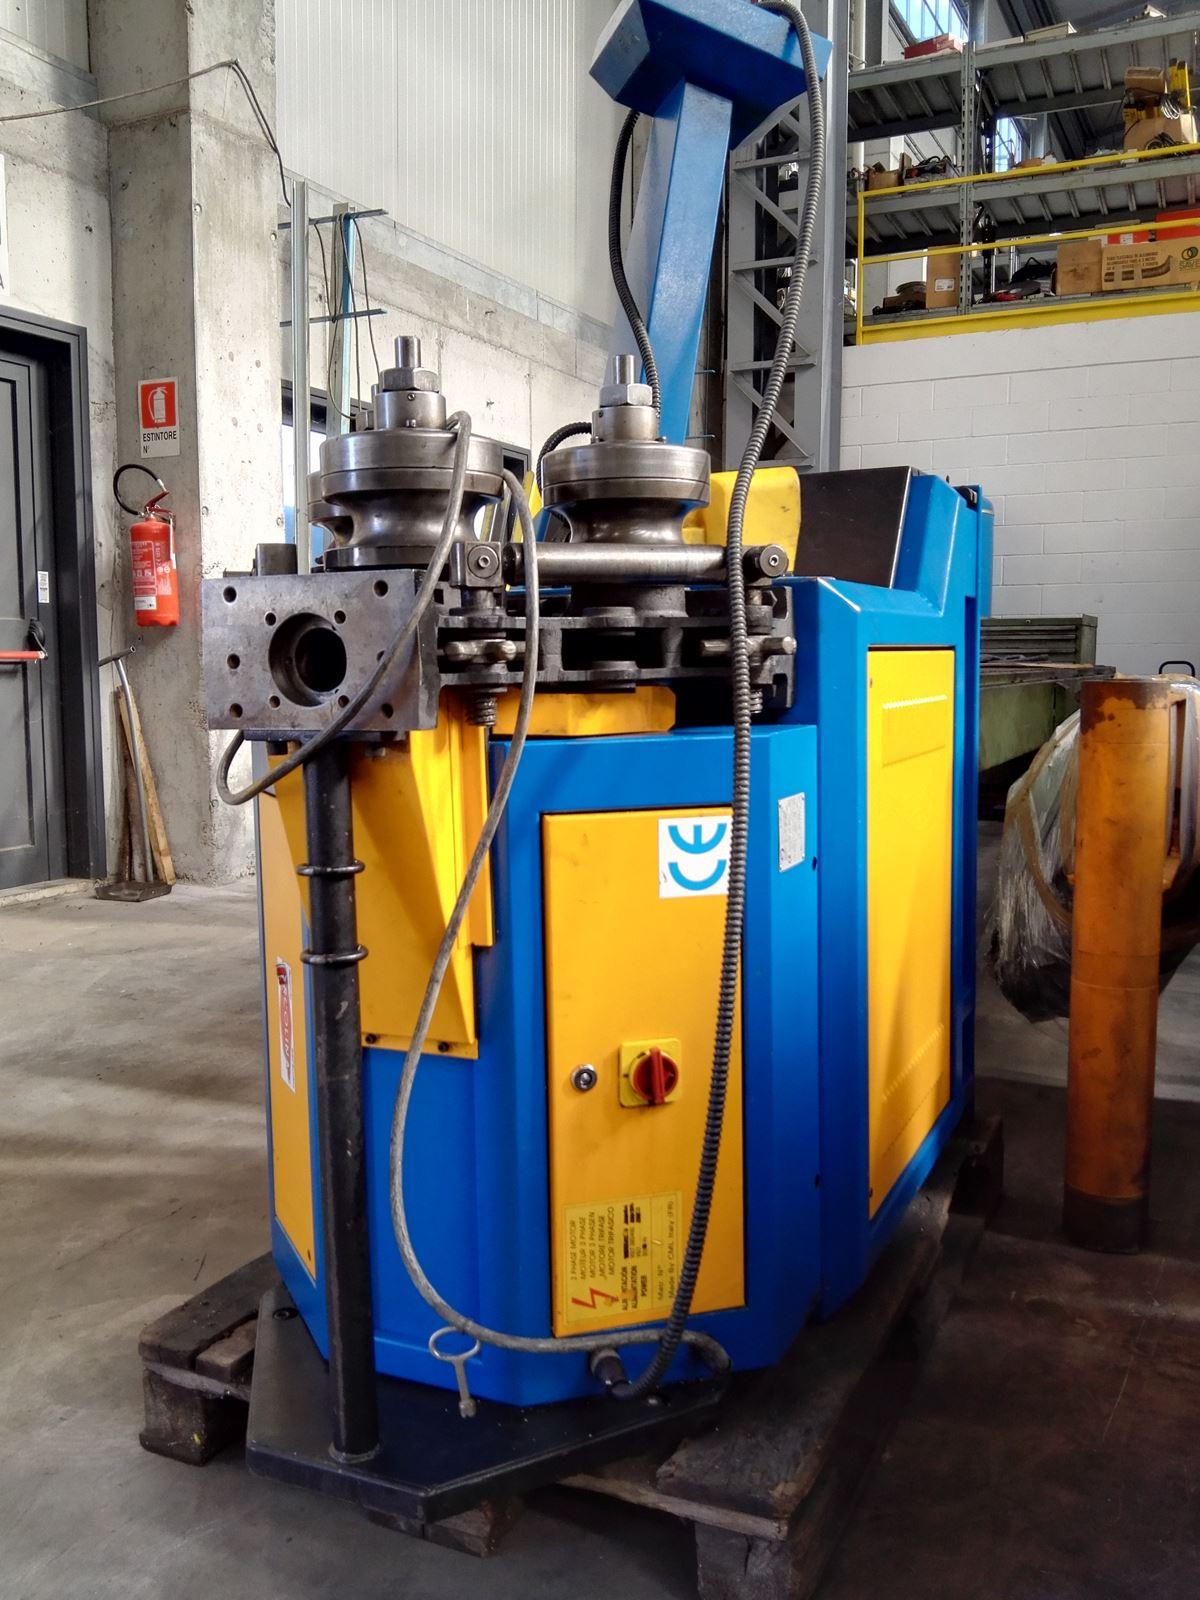 Curvadora de tubo ercolina 50 h3 maquinas de segunda mano for Curvadora de tubos segunda mano